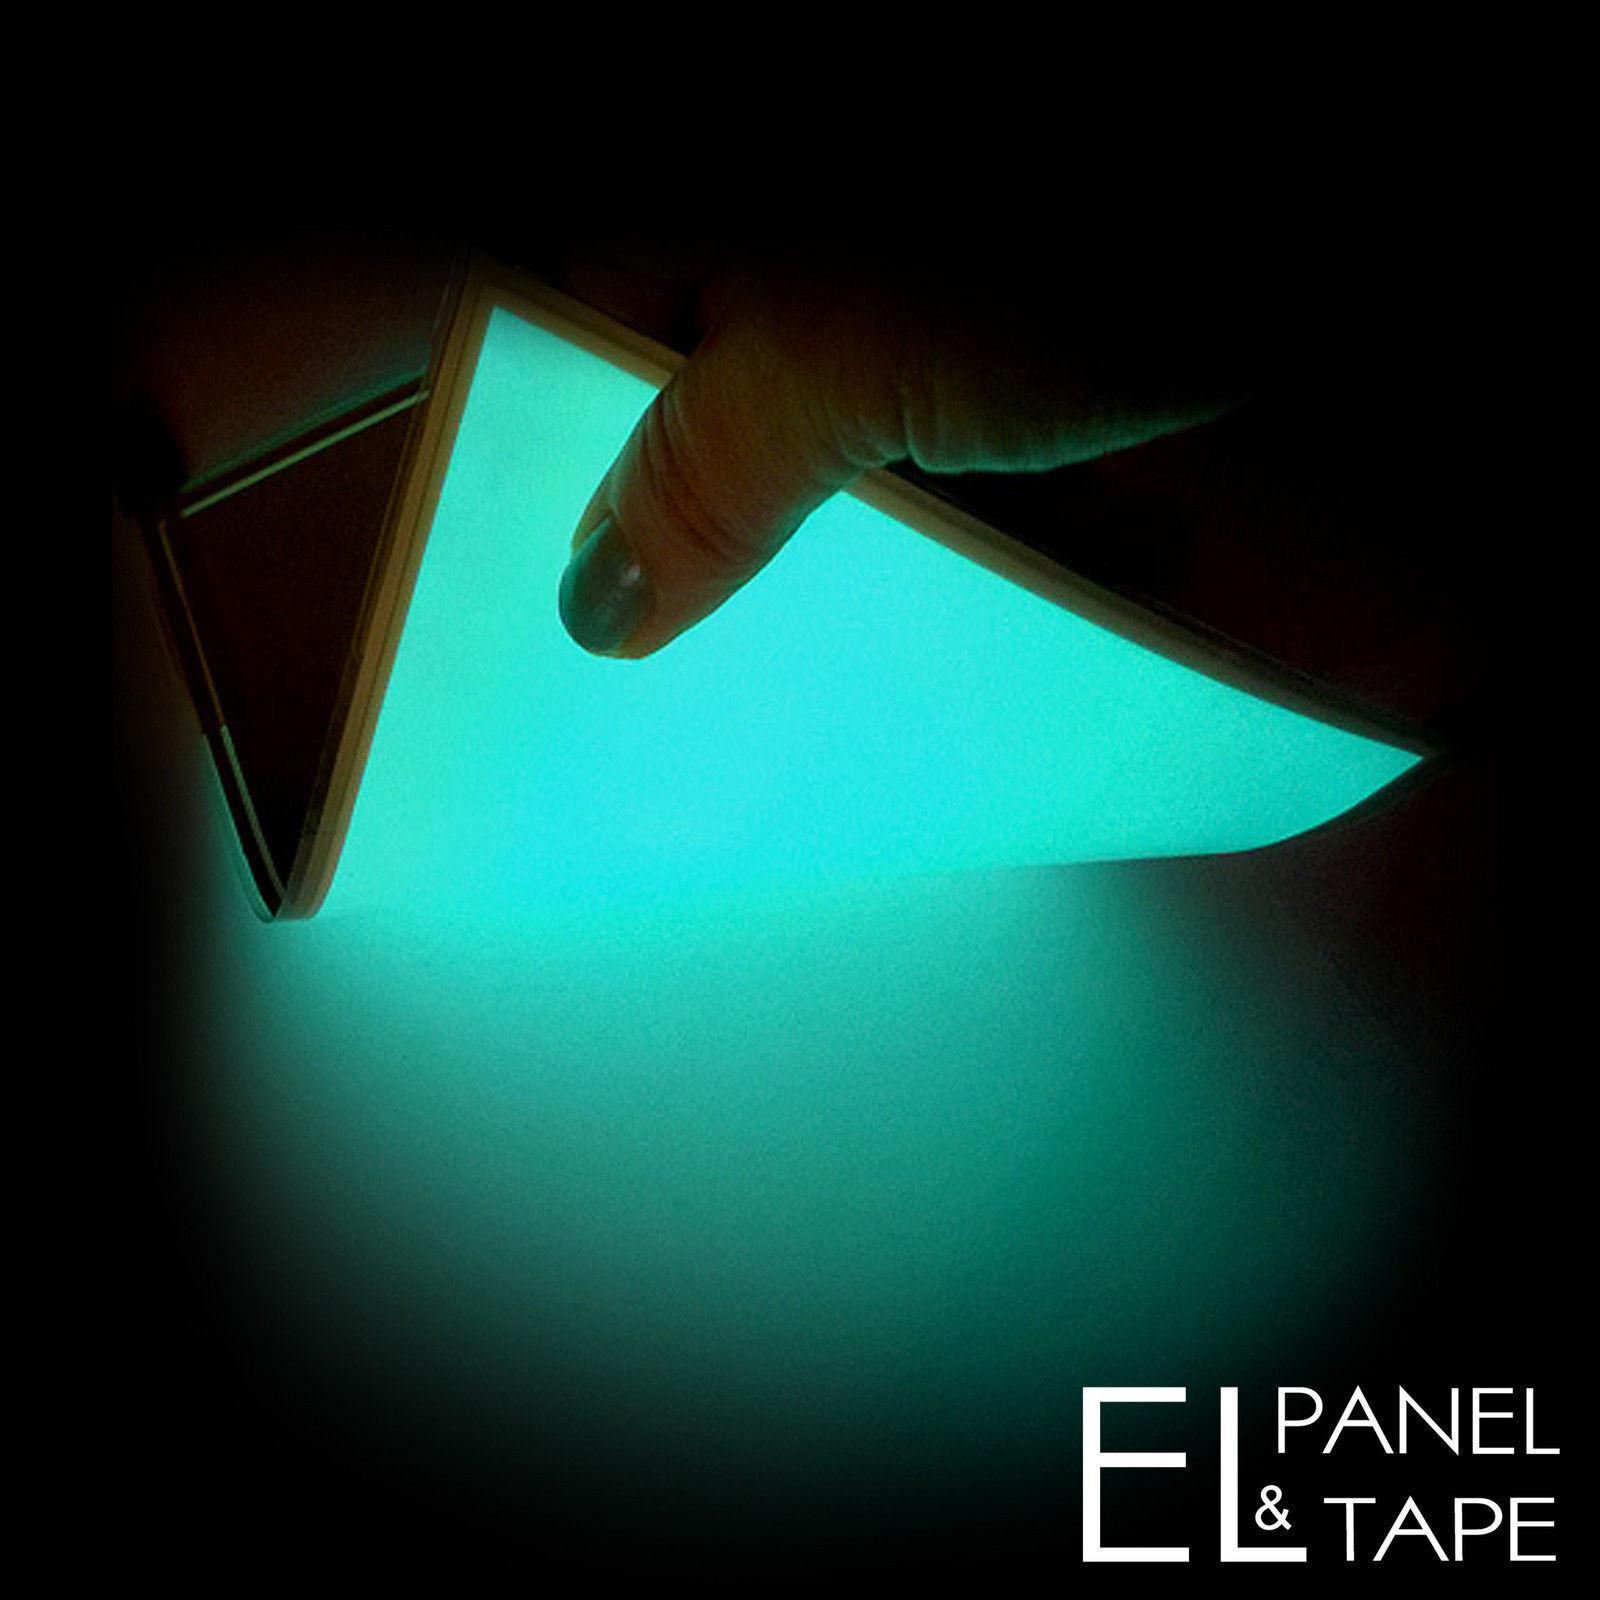 A6 Größe - EL Panel (10.7cm x 15cm) - No Backing - Electroluminescent Sheet